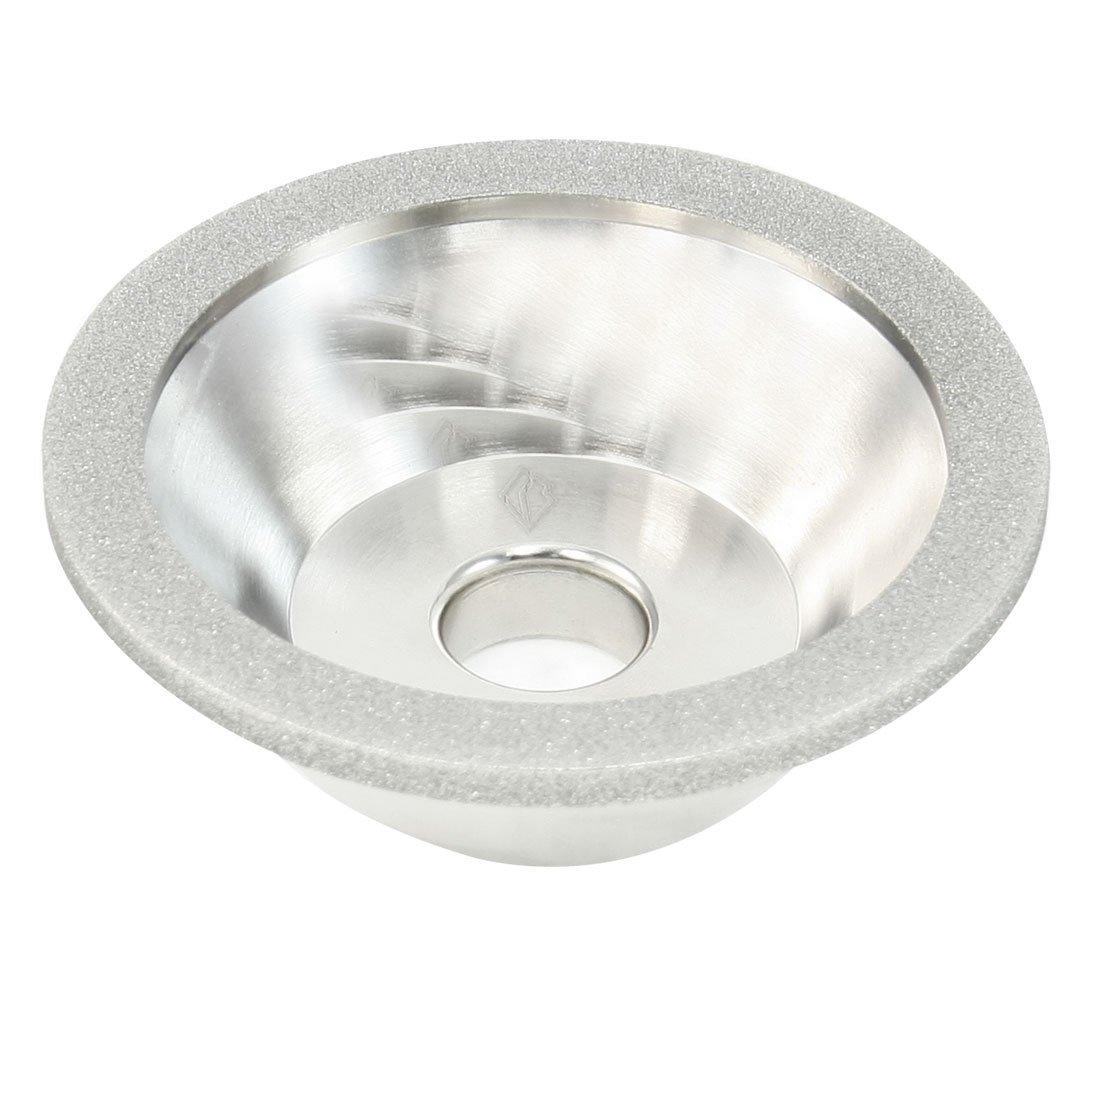 uxcell 150 Grit 100mm Outside Dia 20mm Hole Bowl Shape 11C9 Diamond Grinding Wheel